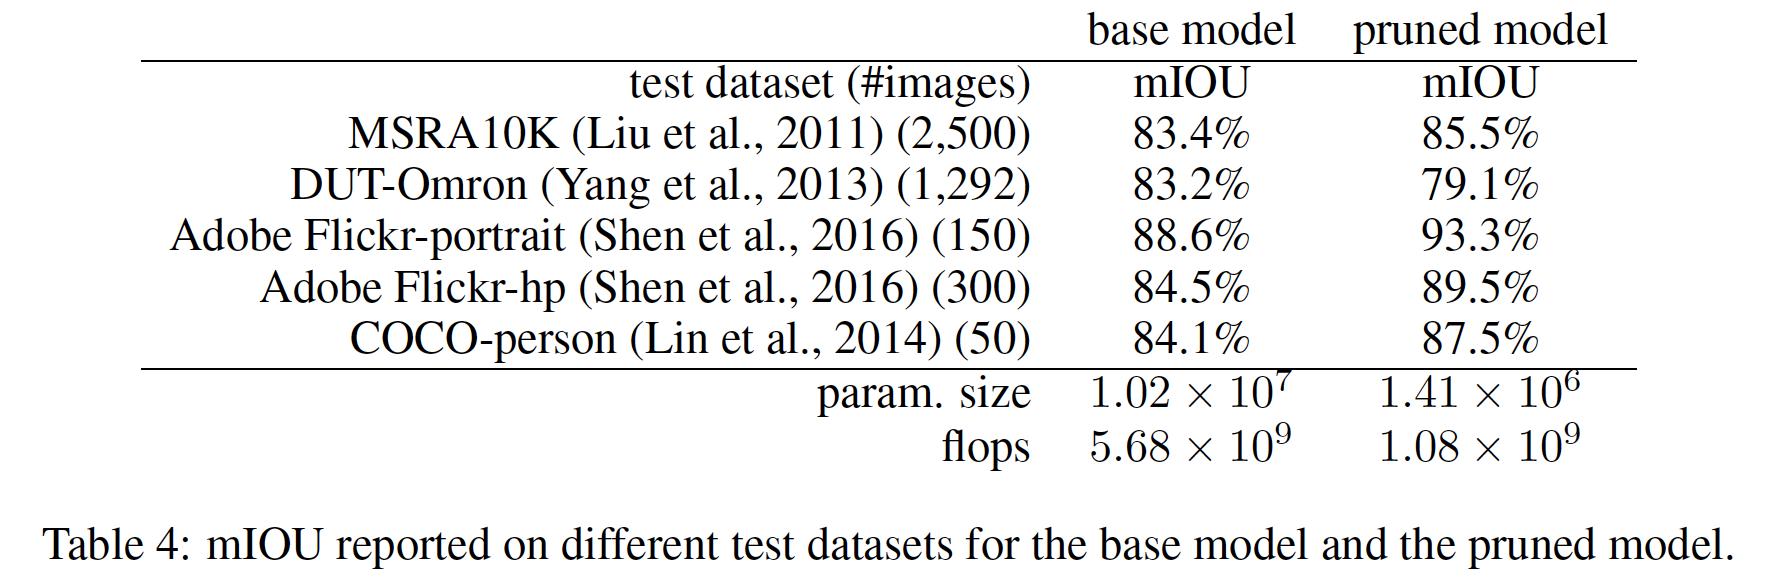 File:paper8 Segmentation png - statwiki